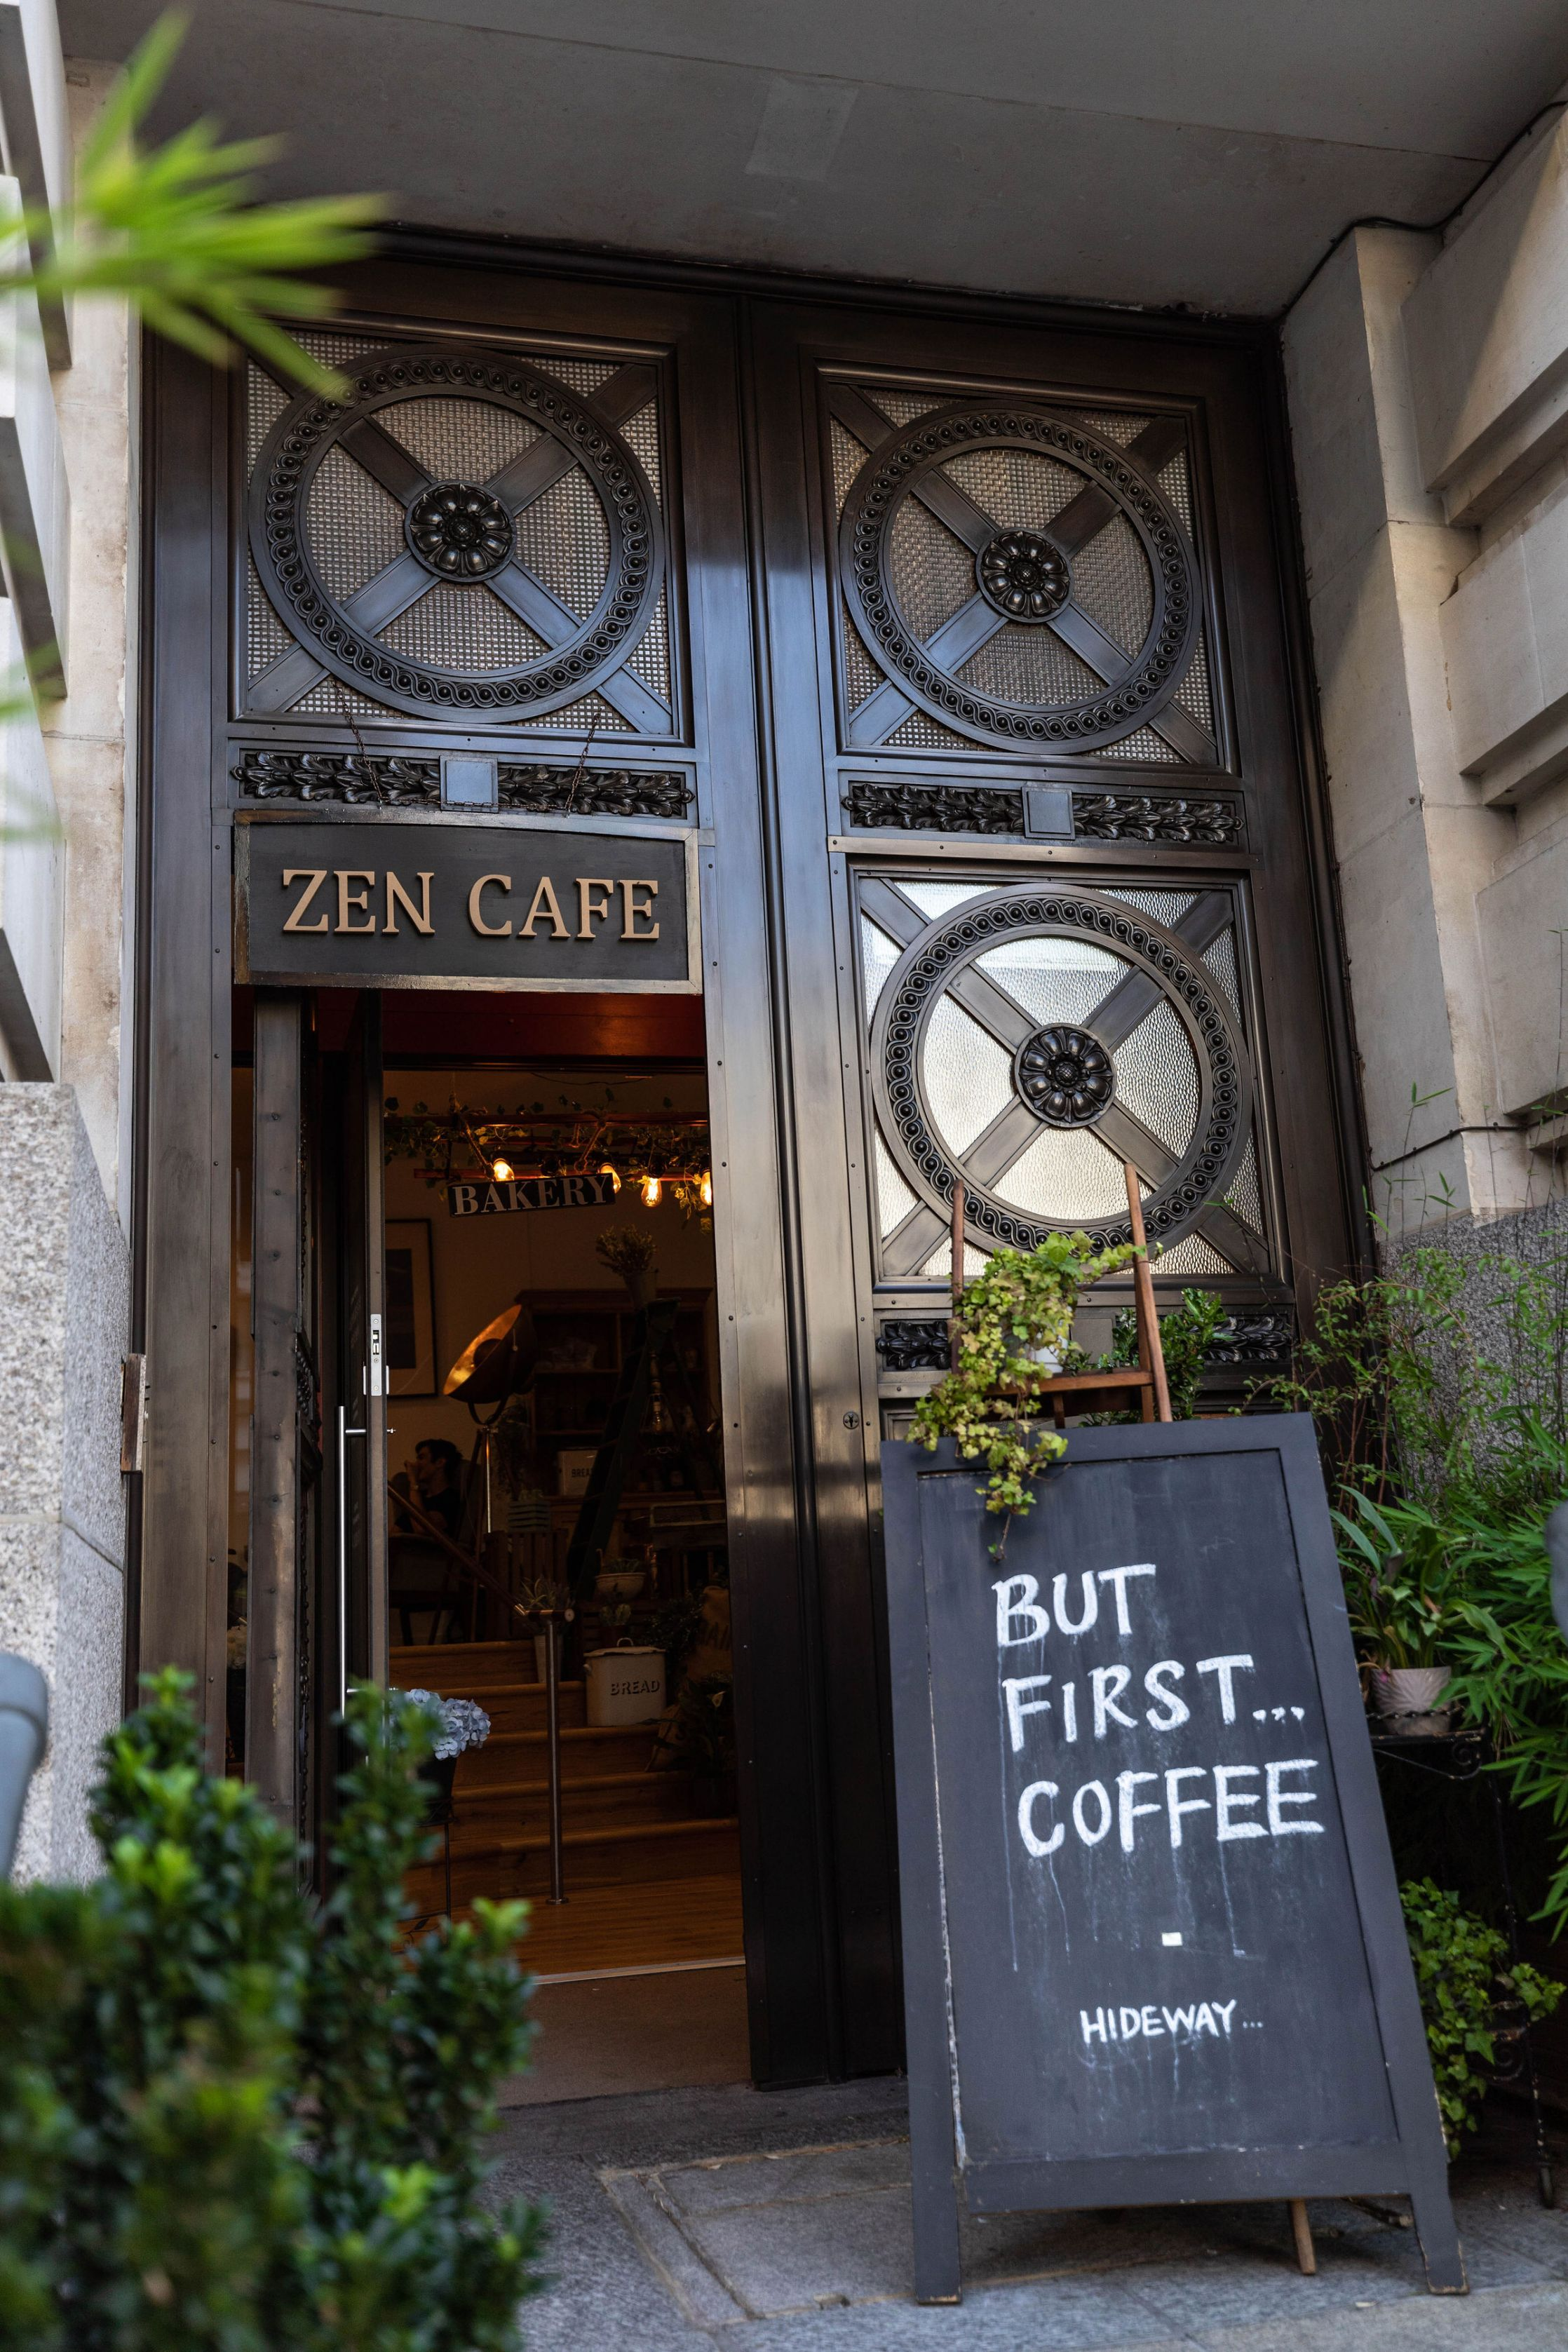 Zen Café London City Guide the Official Travel Guide of London, England